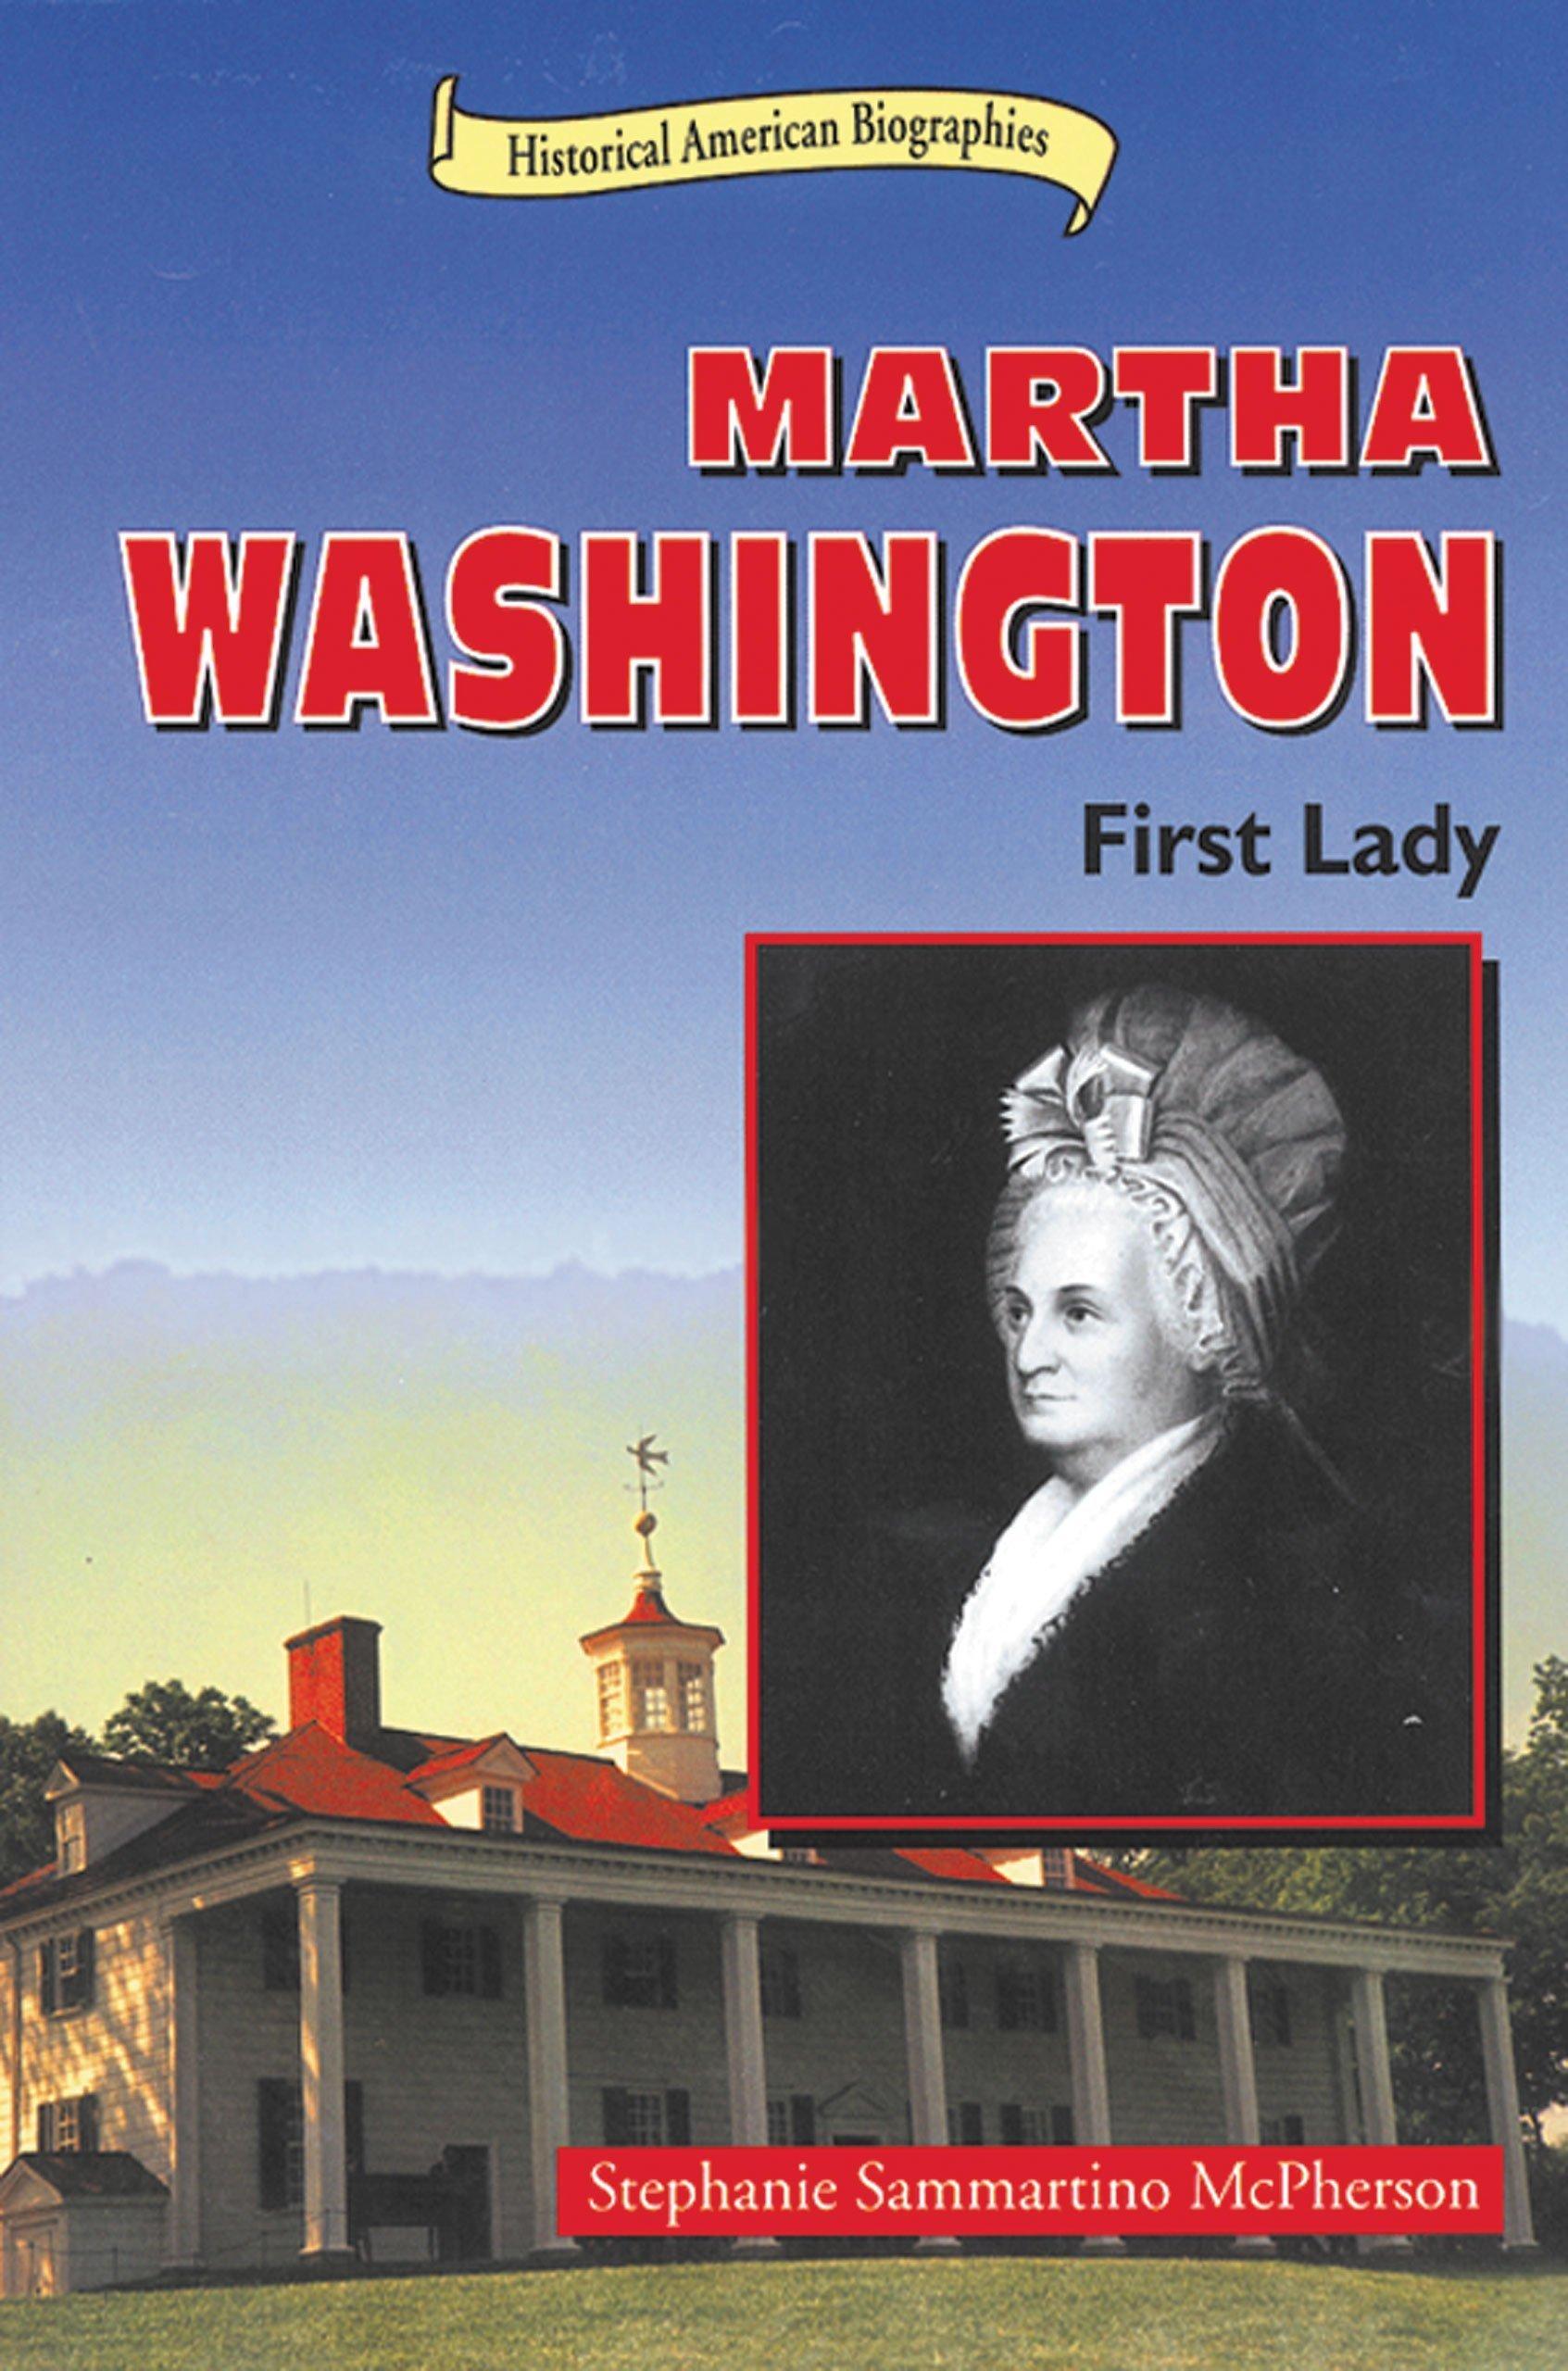 Martha Washington: First Lady (Historical American Biographies)